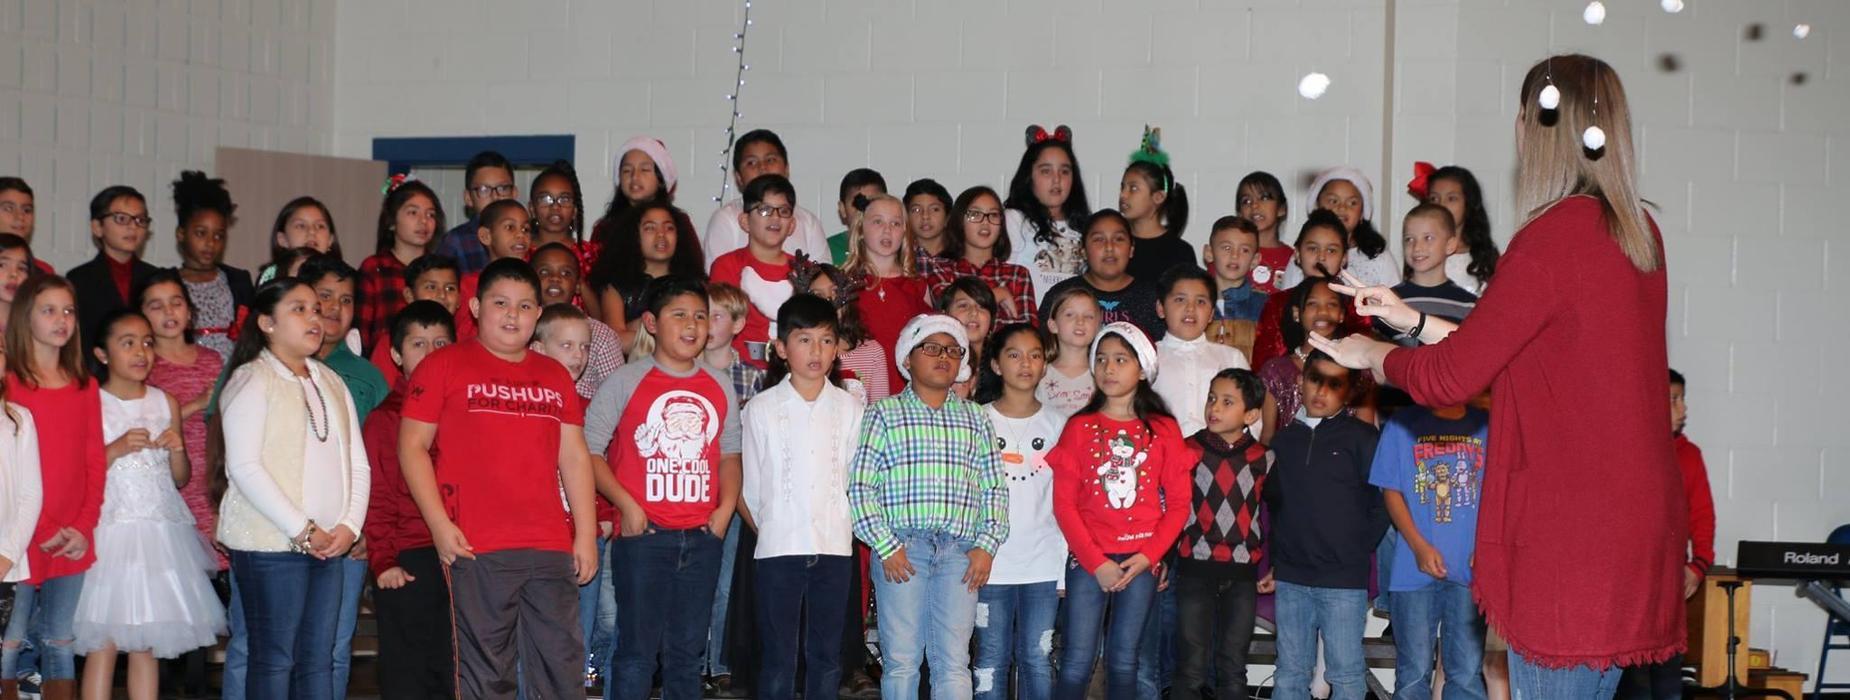 NPE Christmas Bazaar and Program